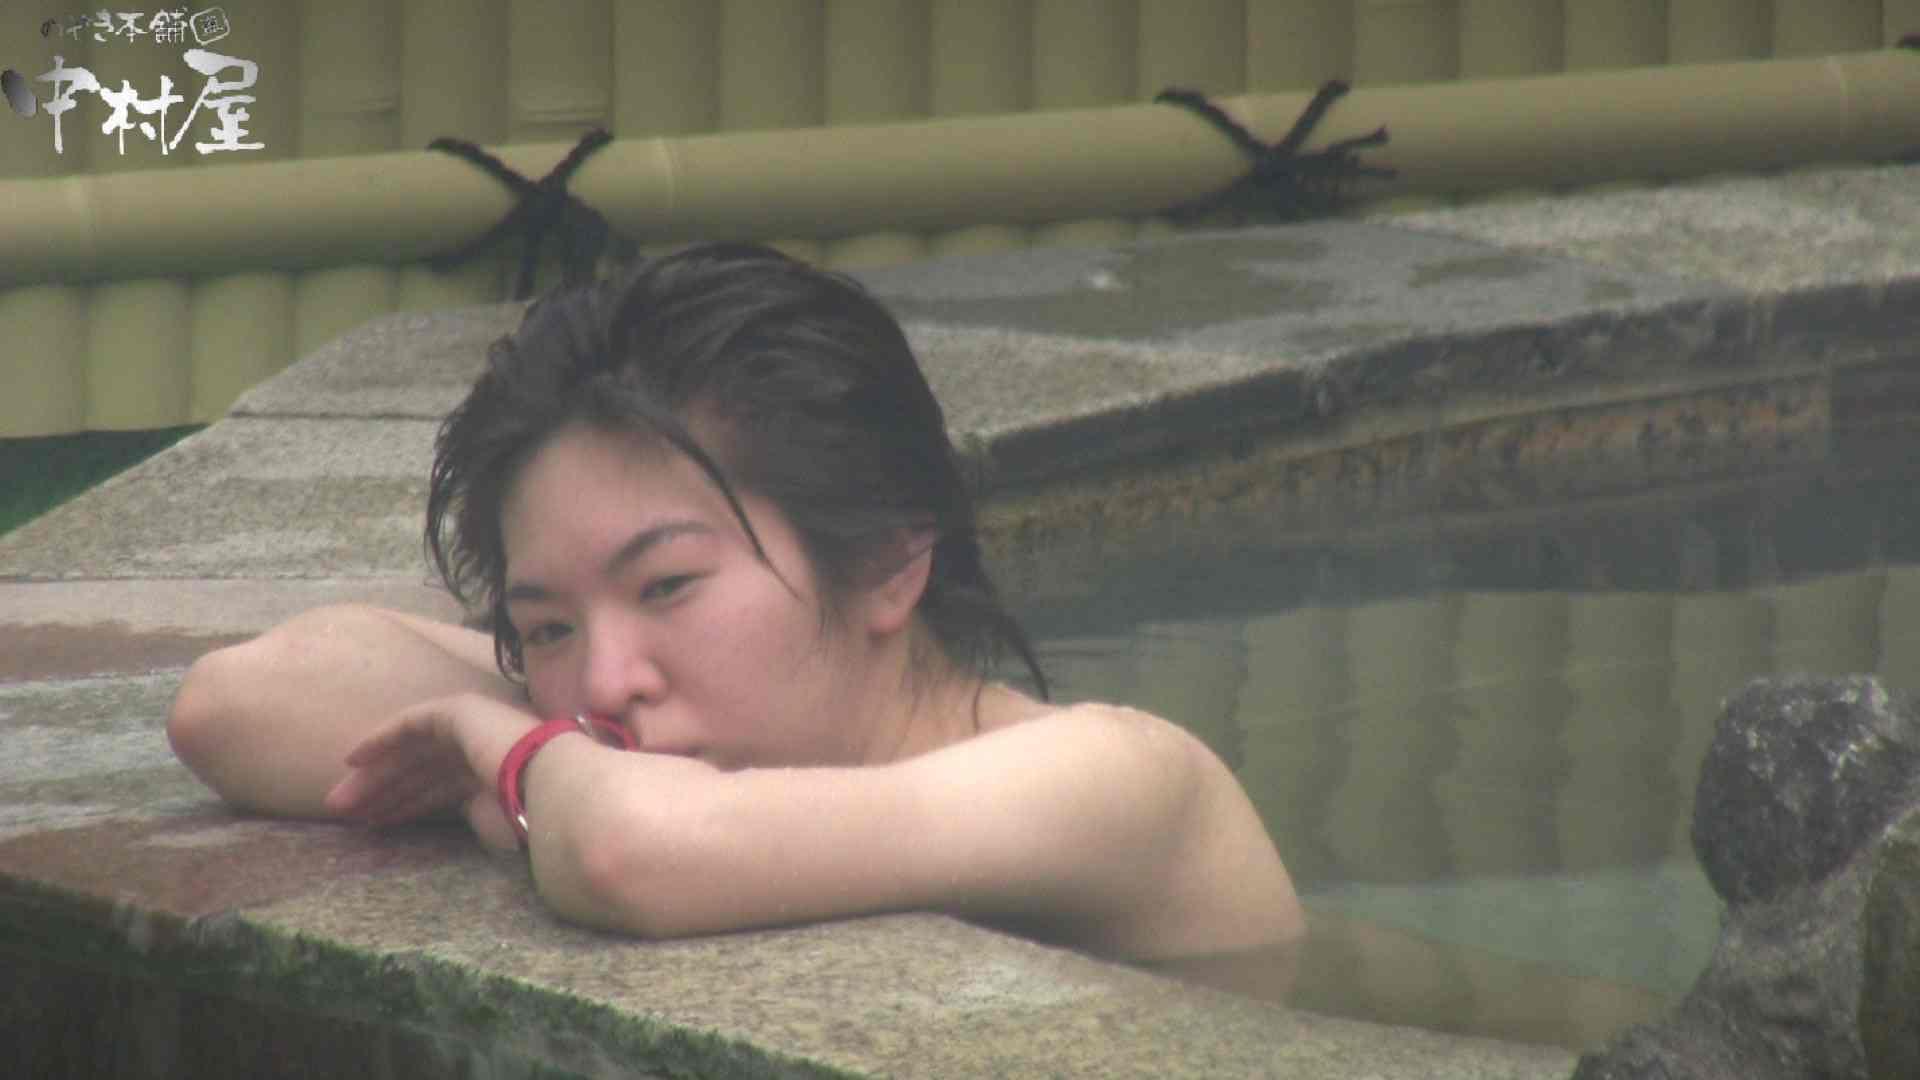 Aquaな露天風呂Vol.907 盗撮特撮  12pic 12